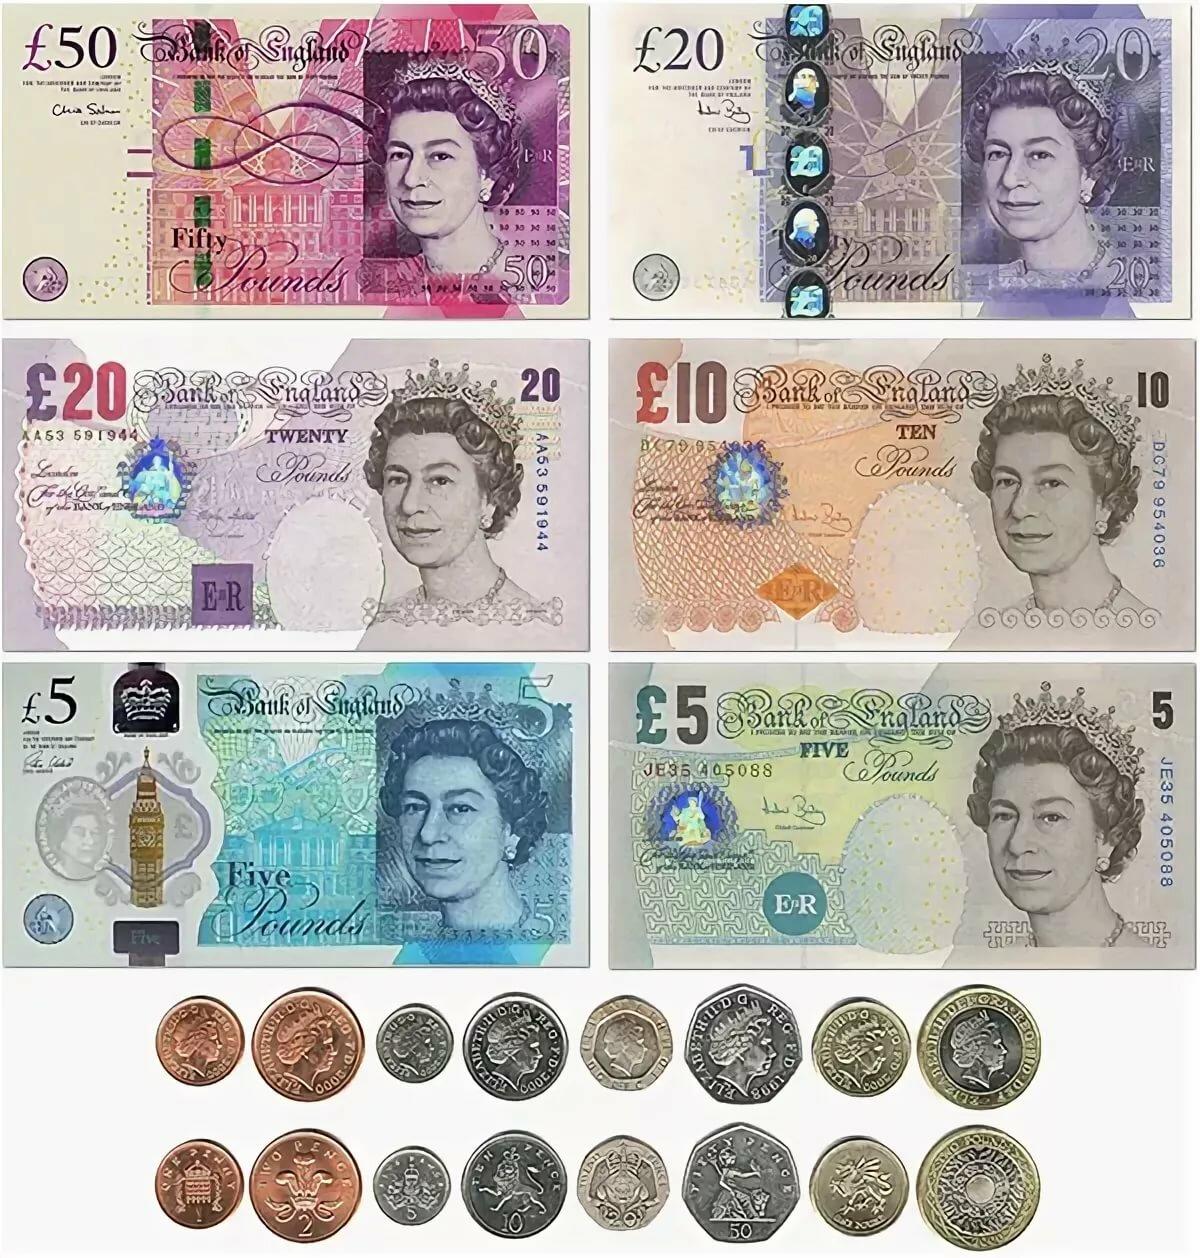 картинки денег фунт стерлингов поймите меня правильно